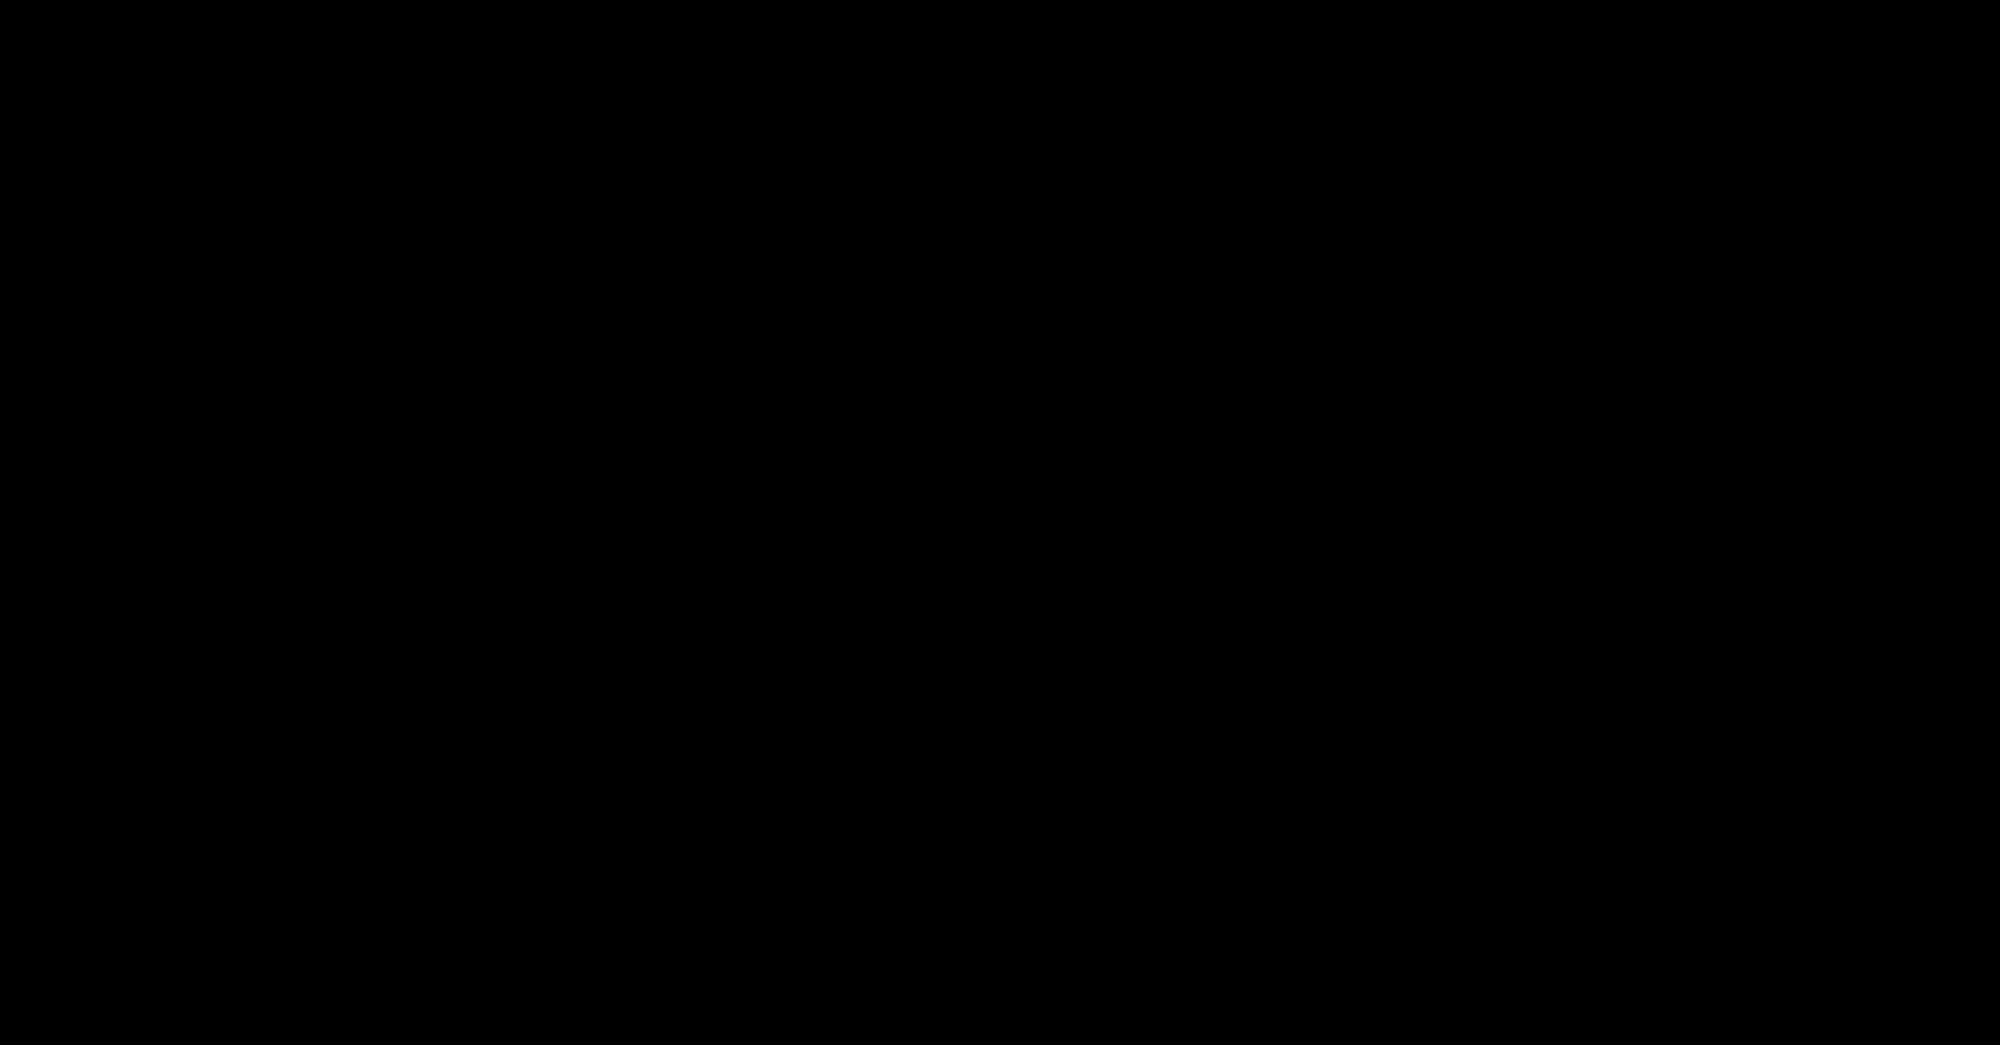 ADO Photo-logo-black.png